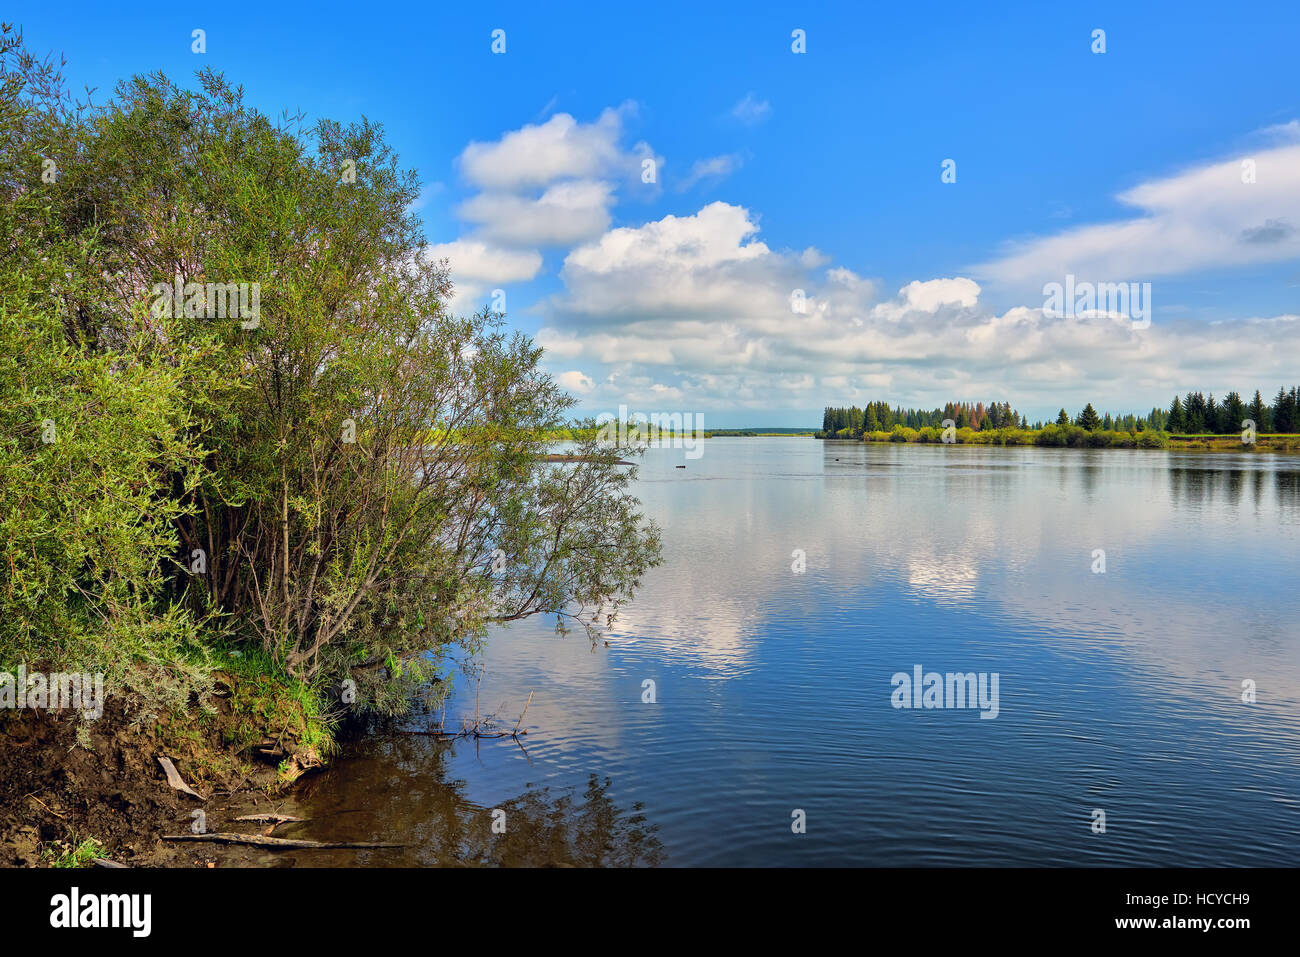 Green willow on bank of Irkut River. Eastern Siberia. Russia - Stock Image